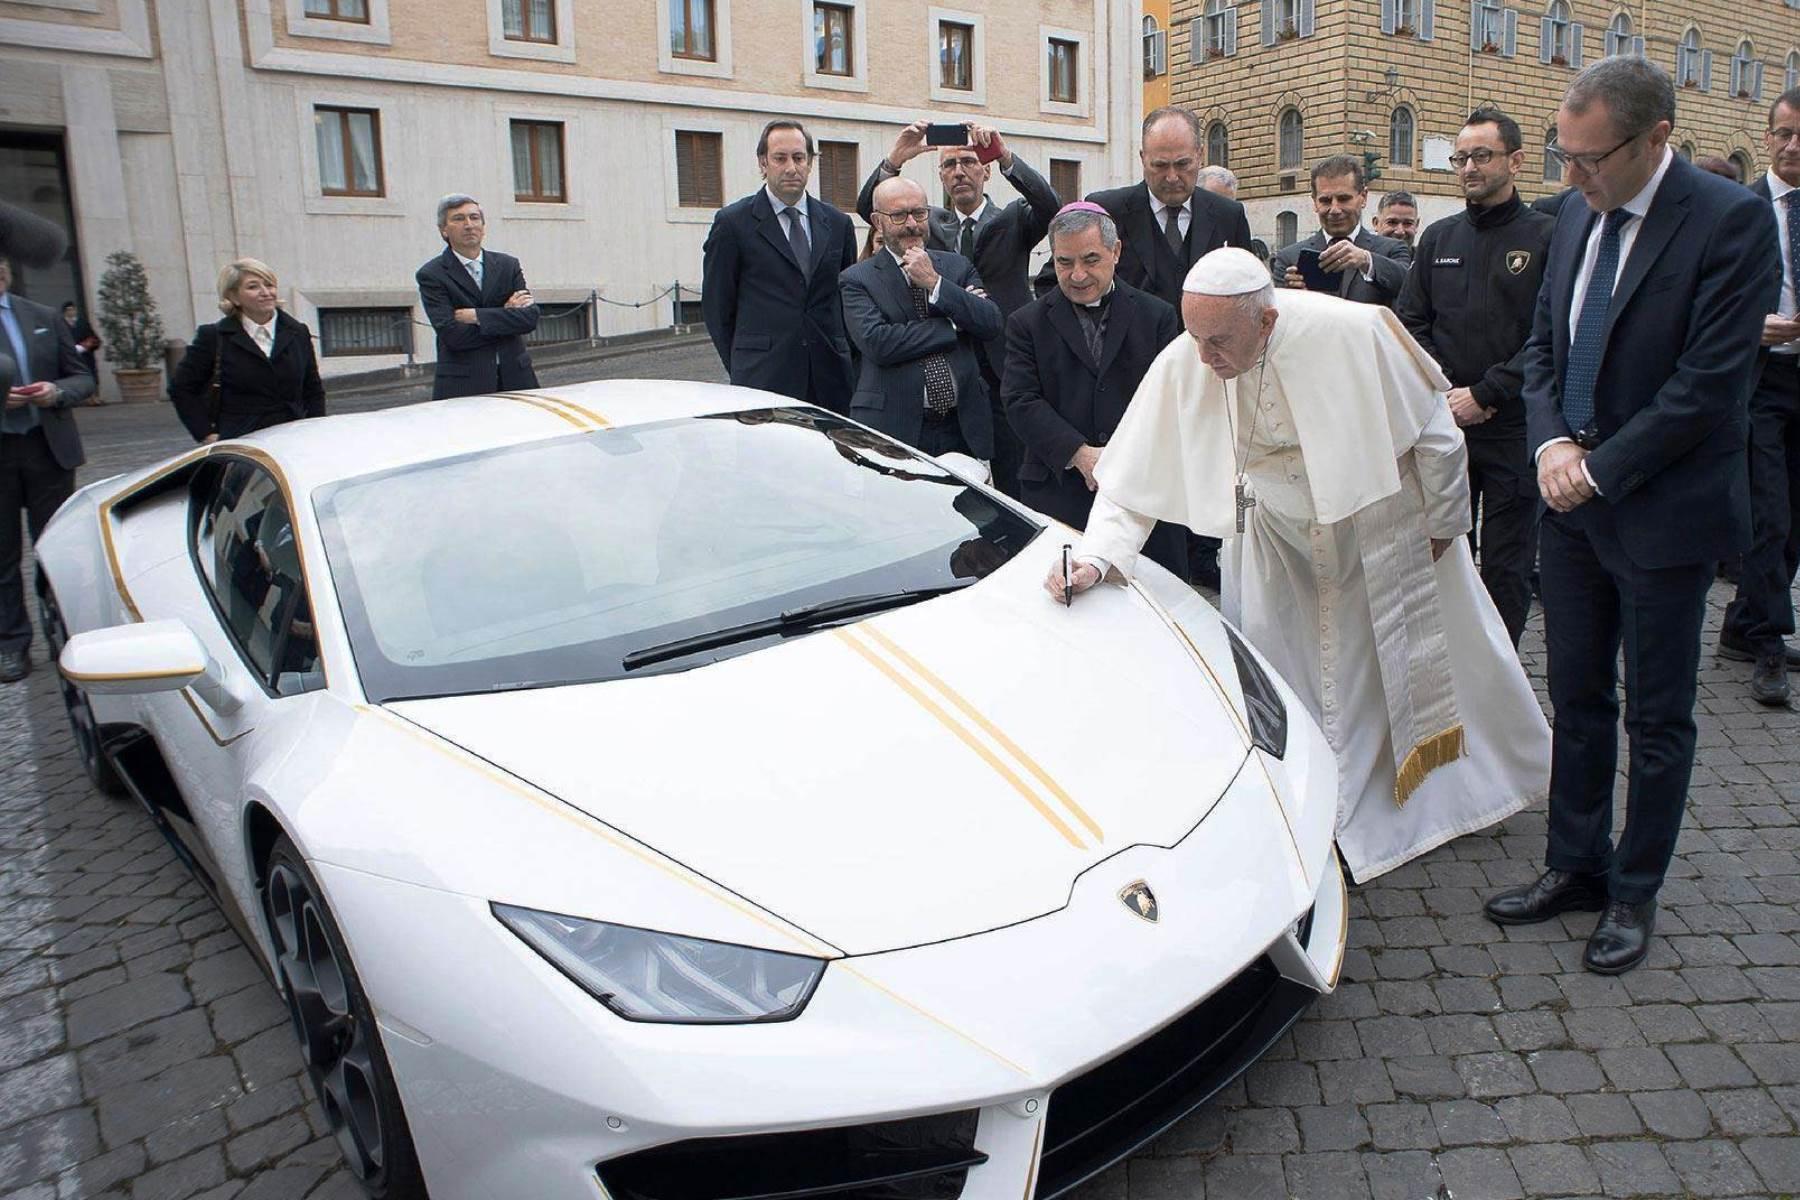 Pope Francis signs special Lamborghini Huracan